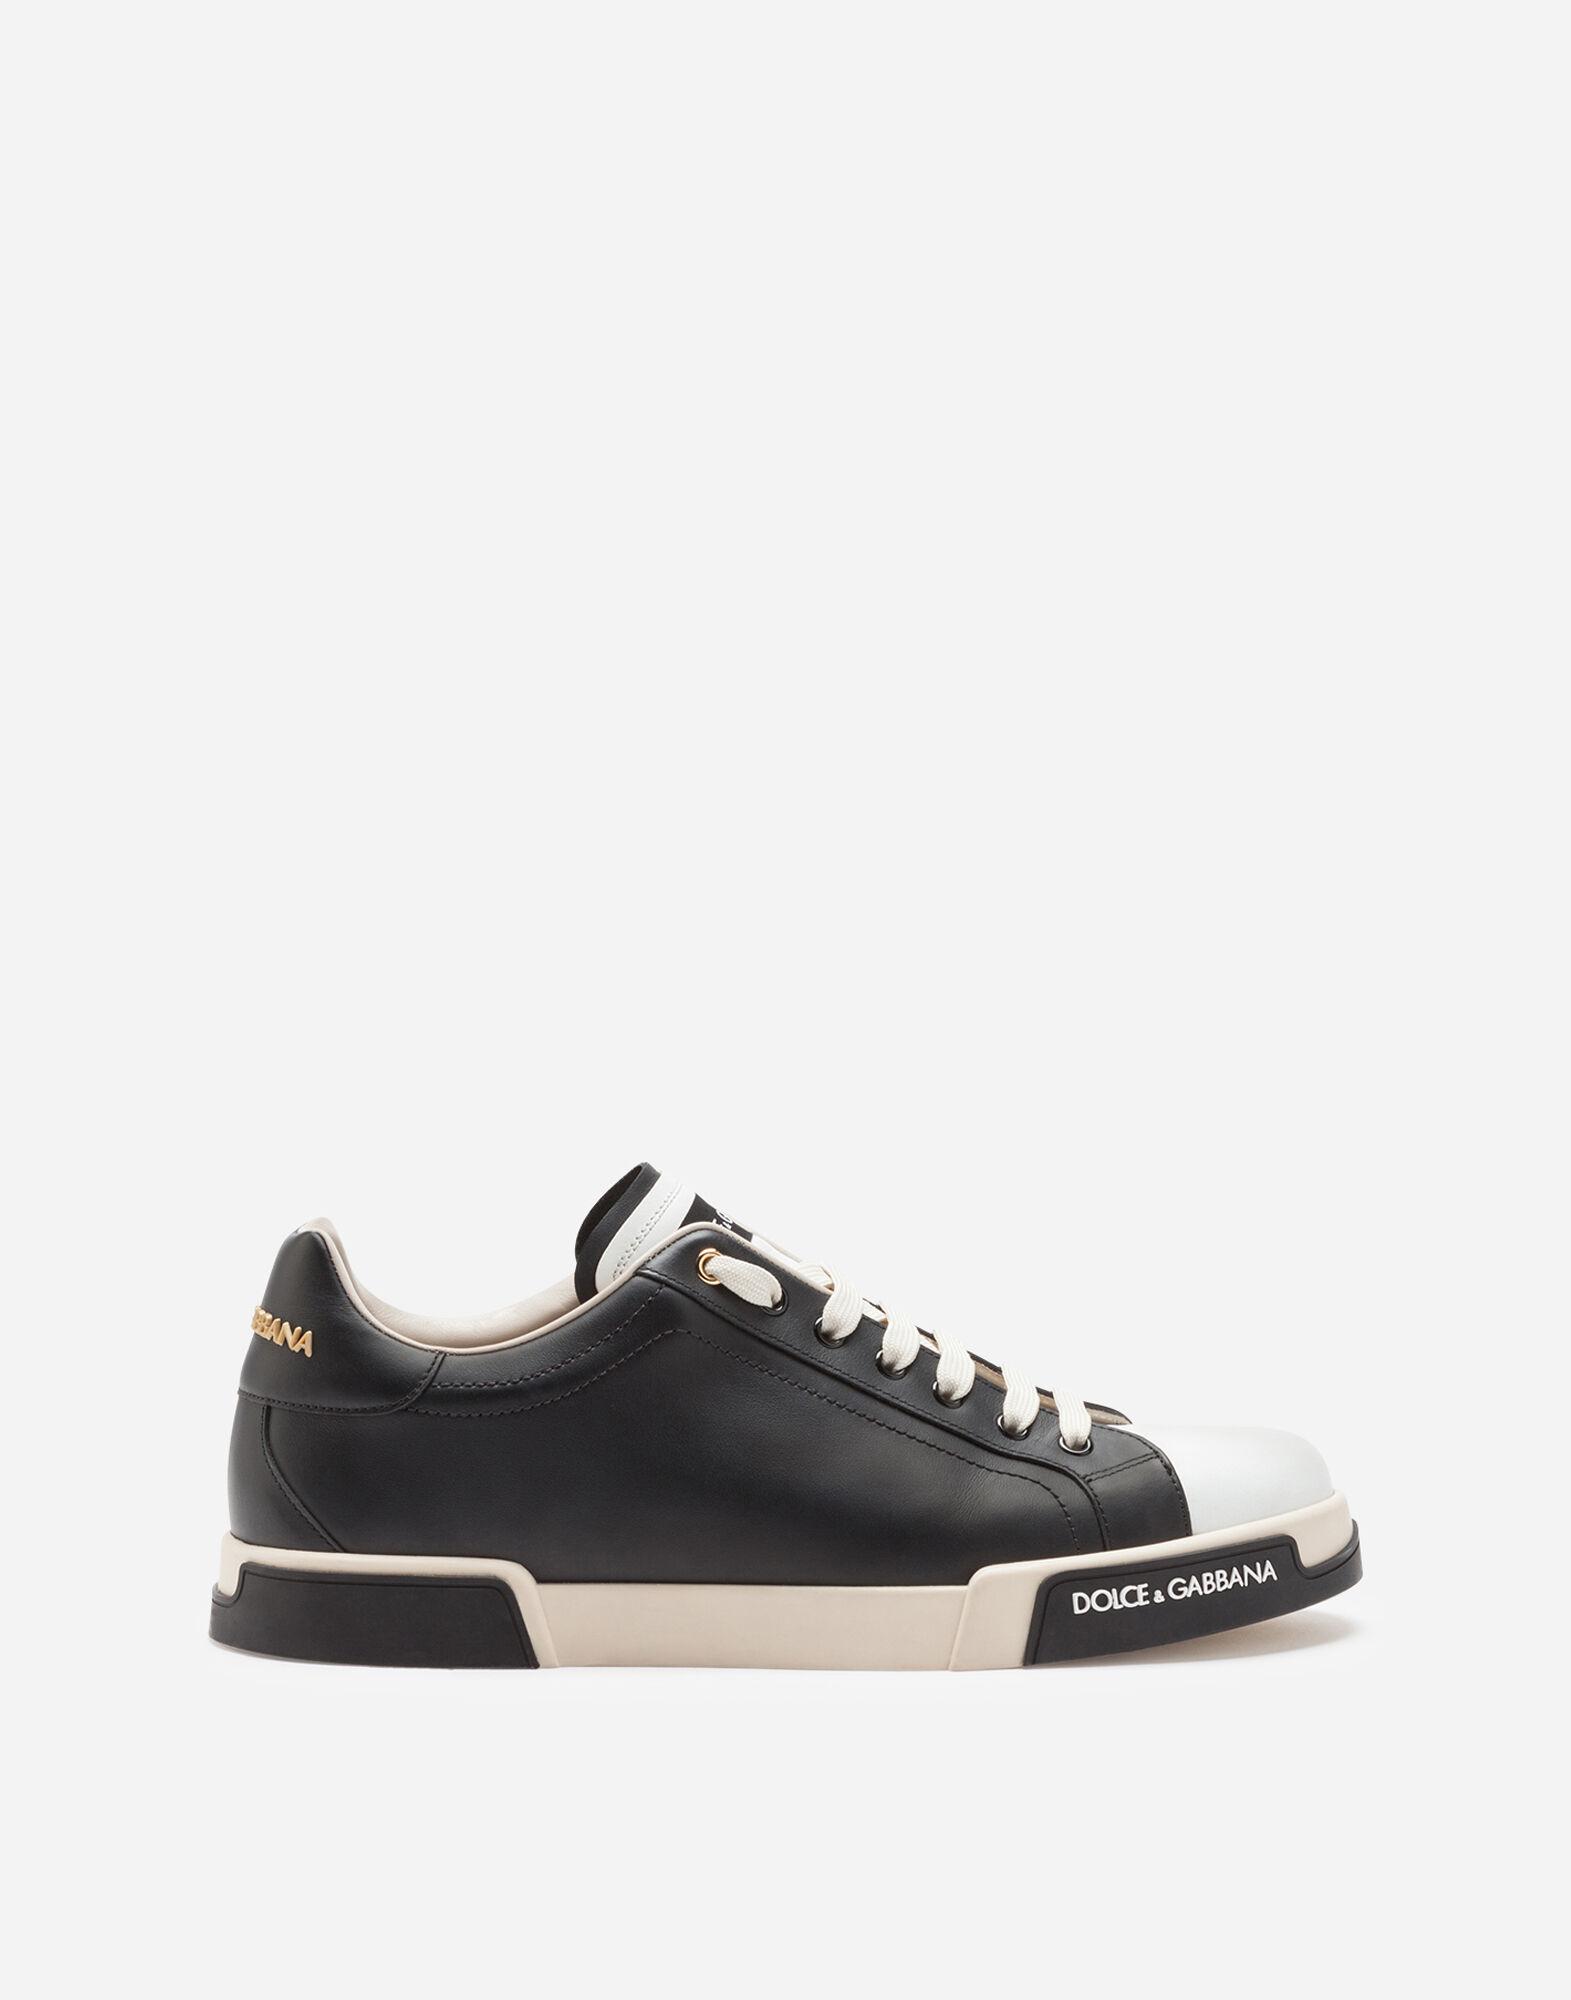 E Slip On Da Sneakers amp;gabbana UomoDolce 8wPXN0nOk